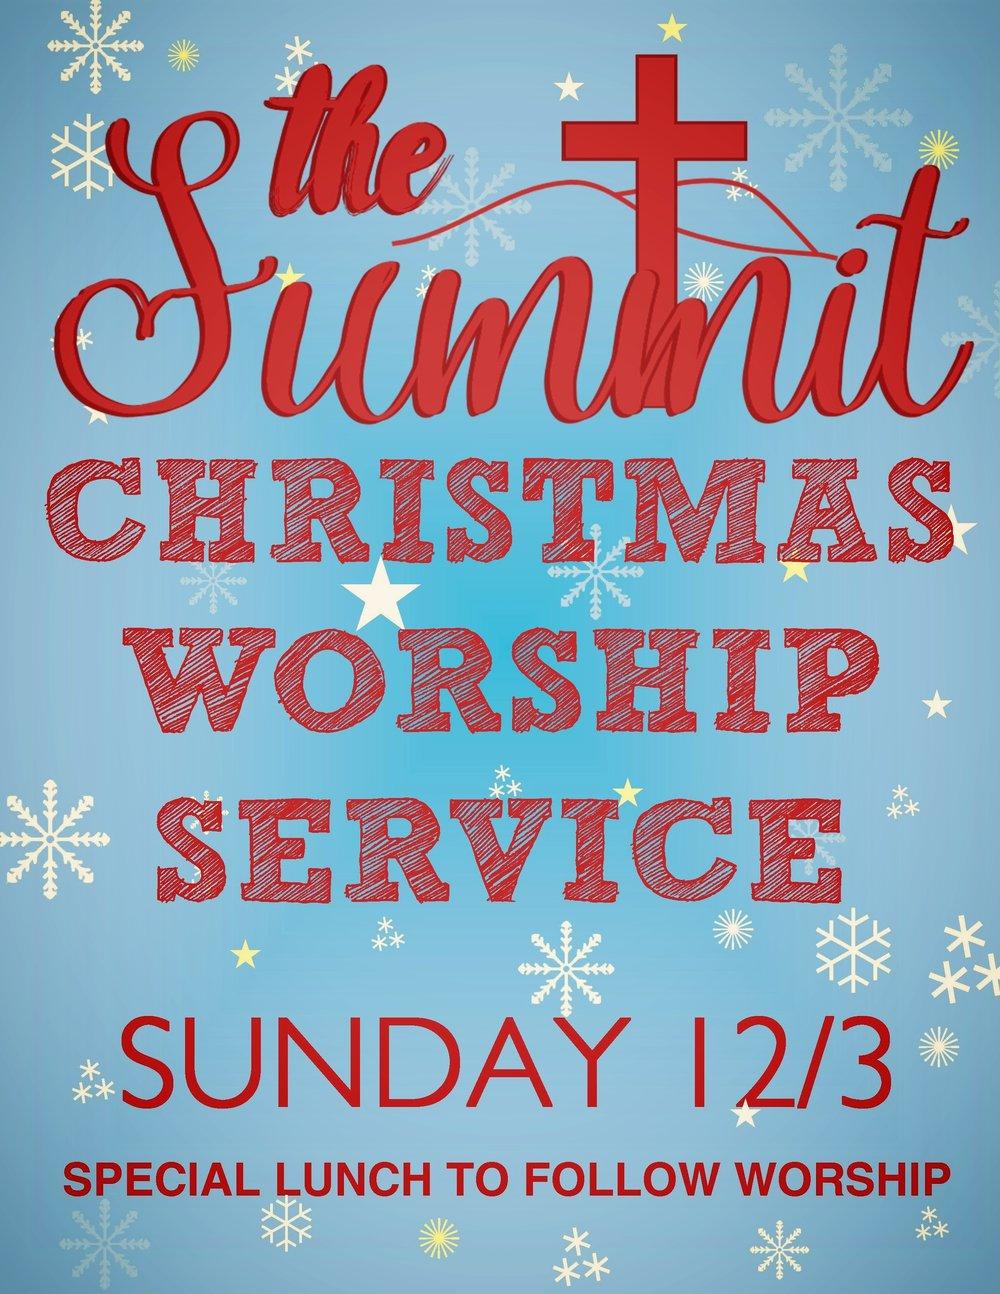 Summit Christmas Service Flyer 112217.jpg